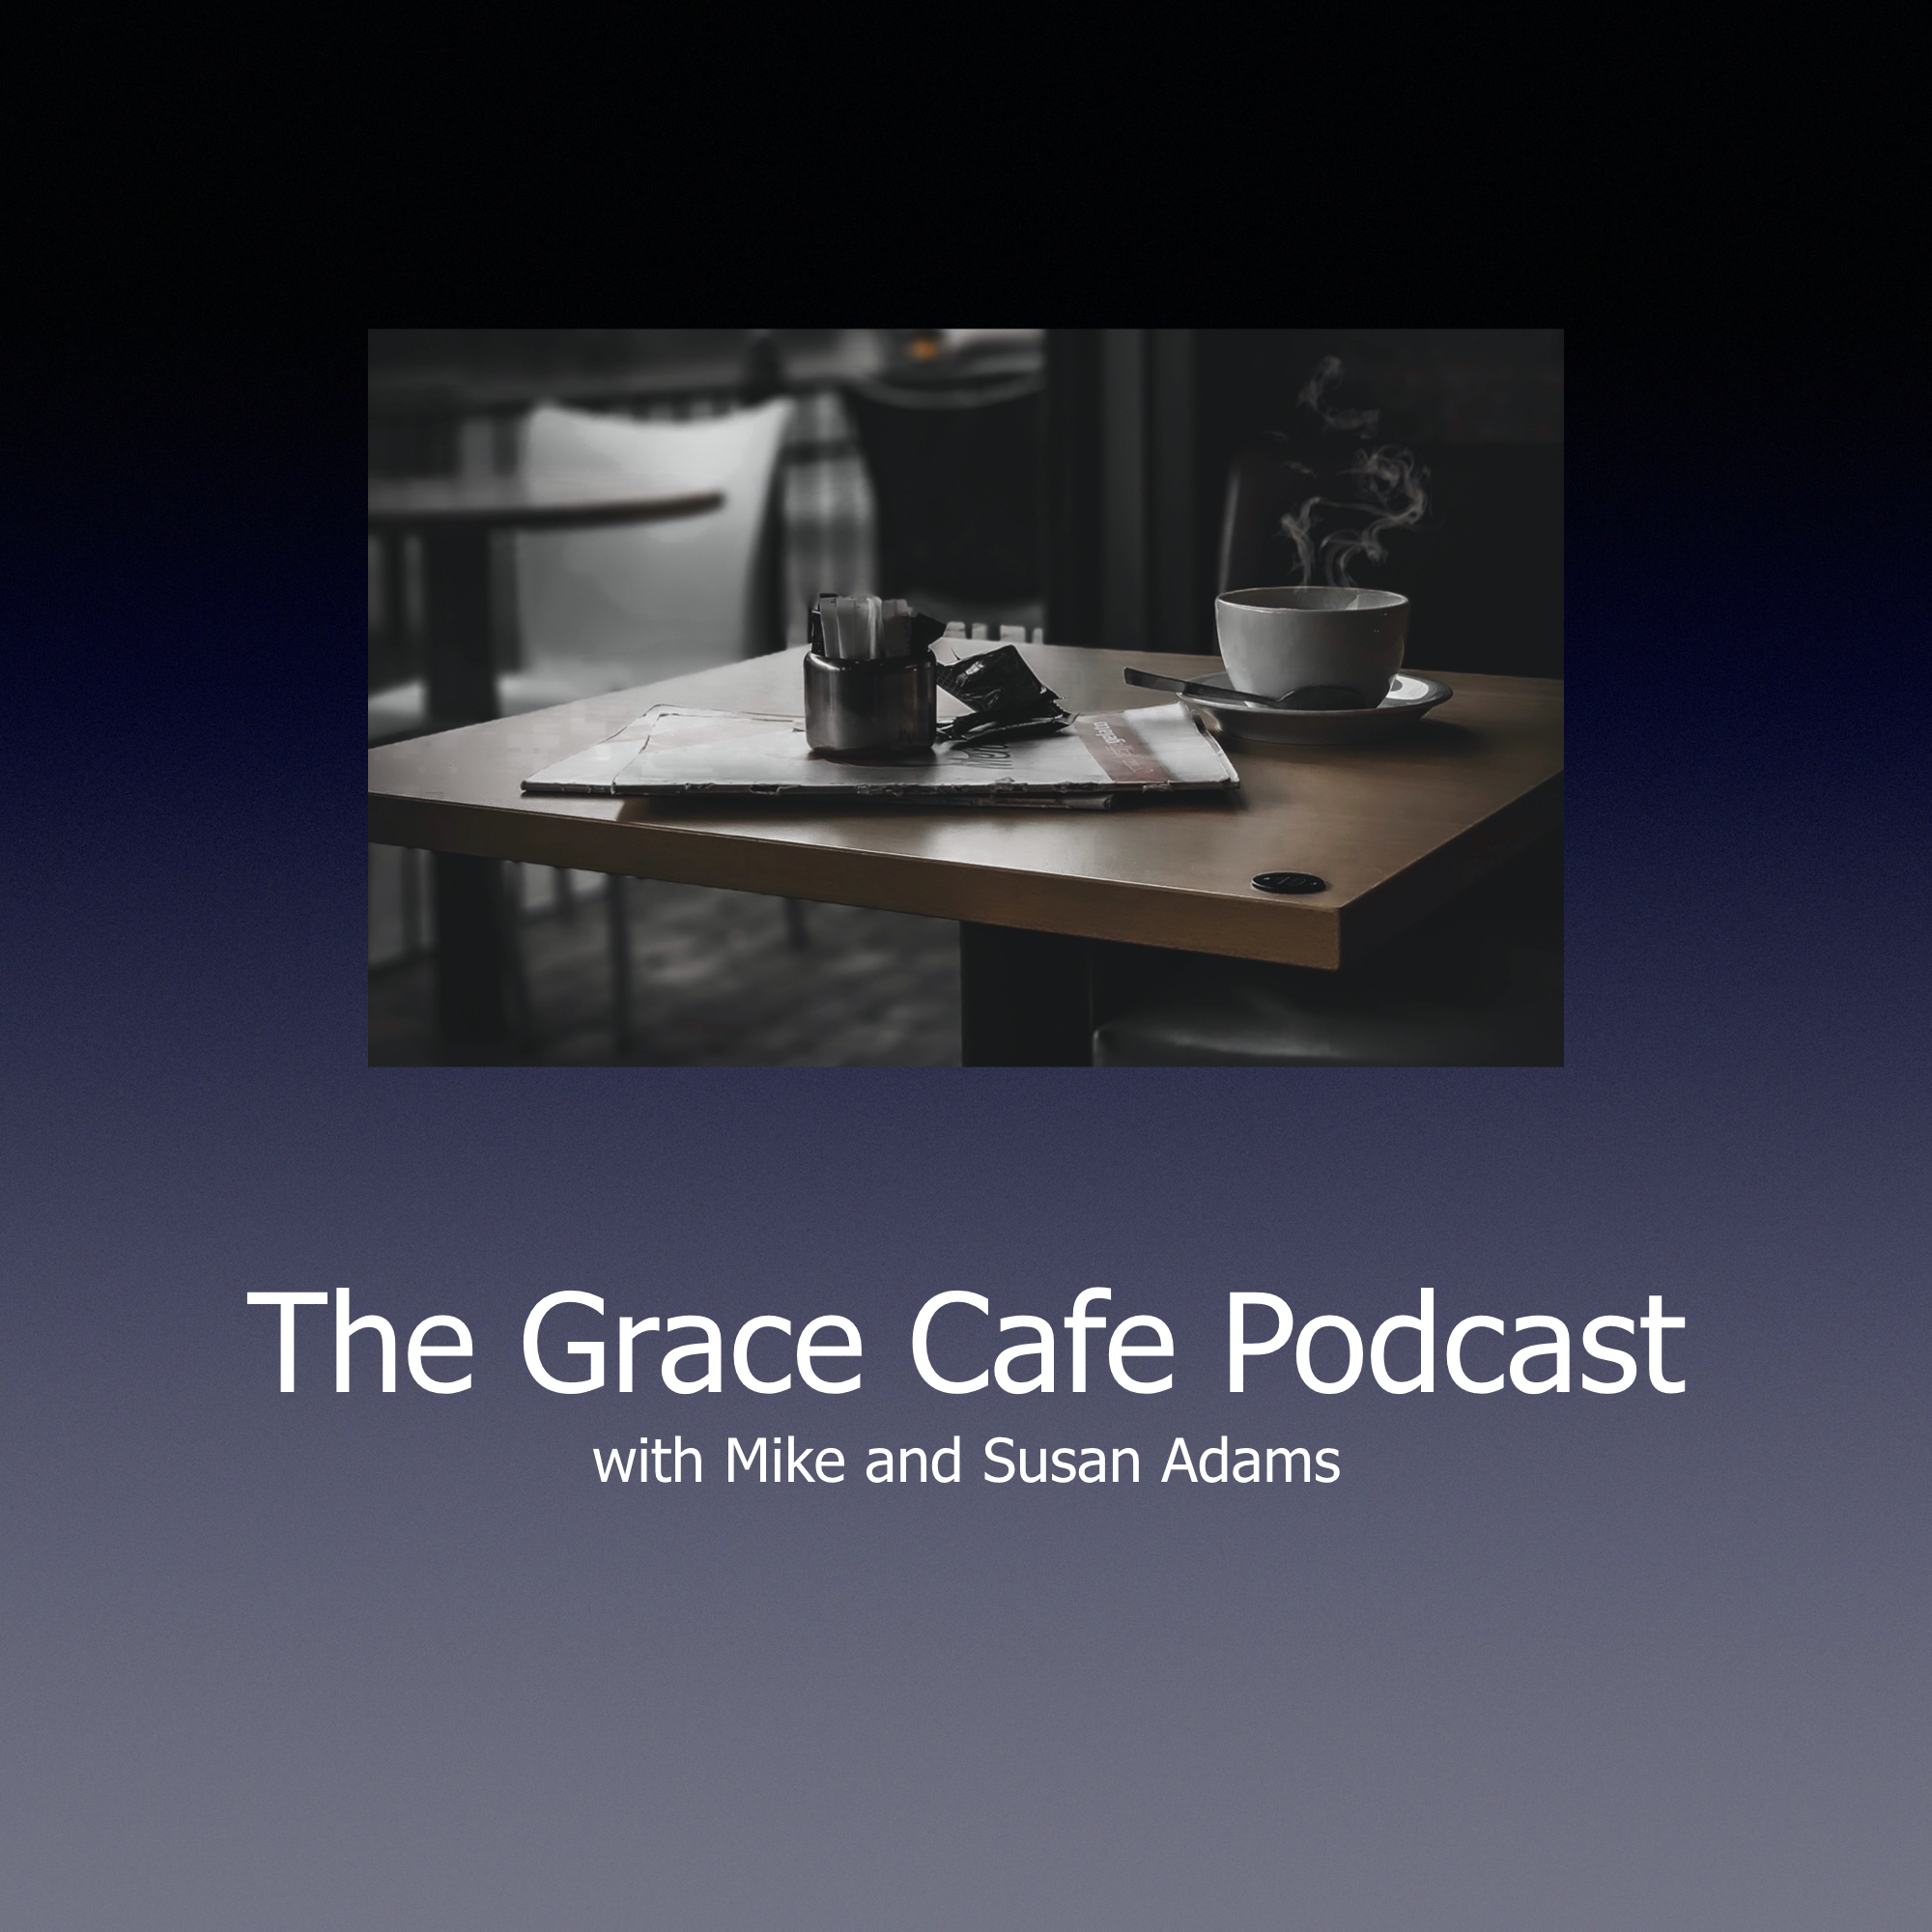 The Grace Cafe Podcast show art